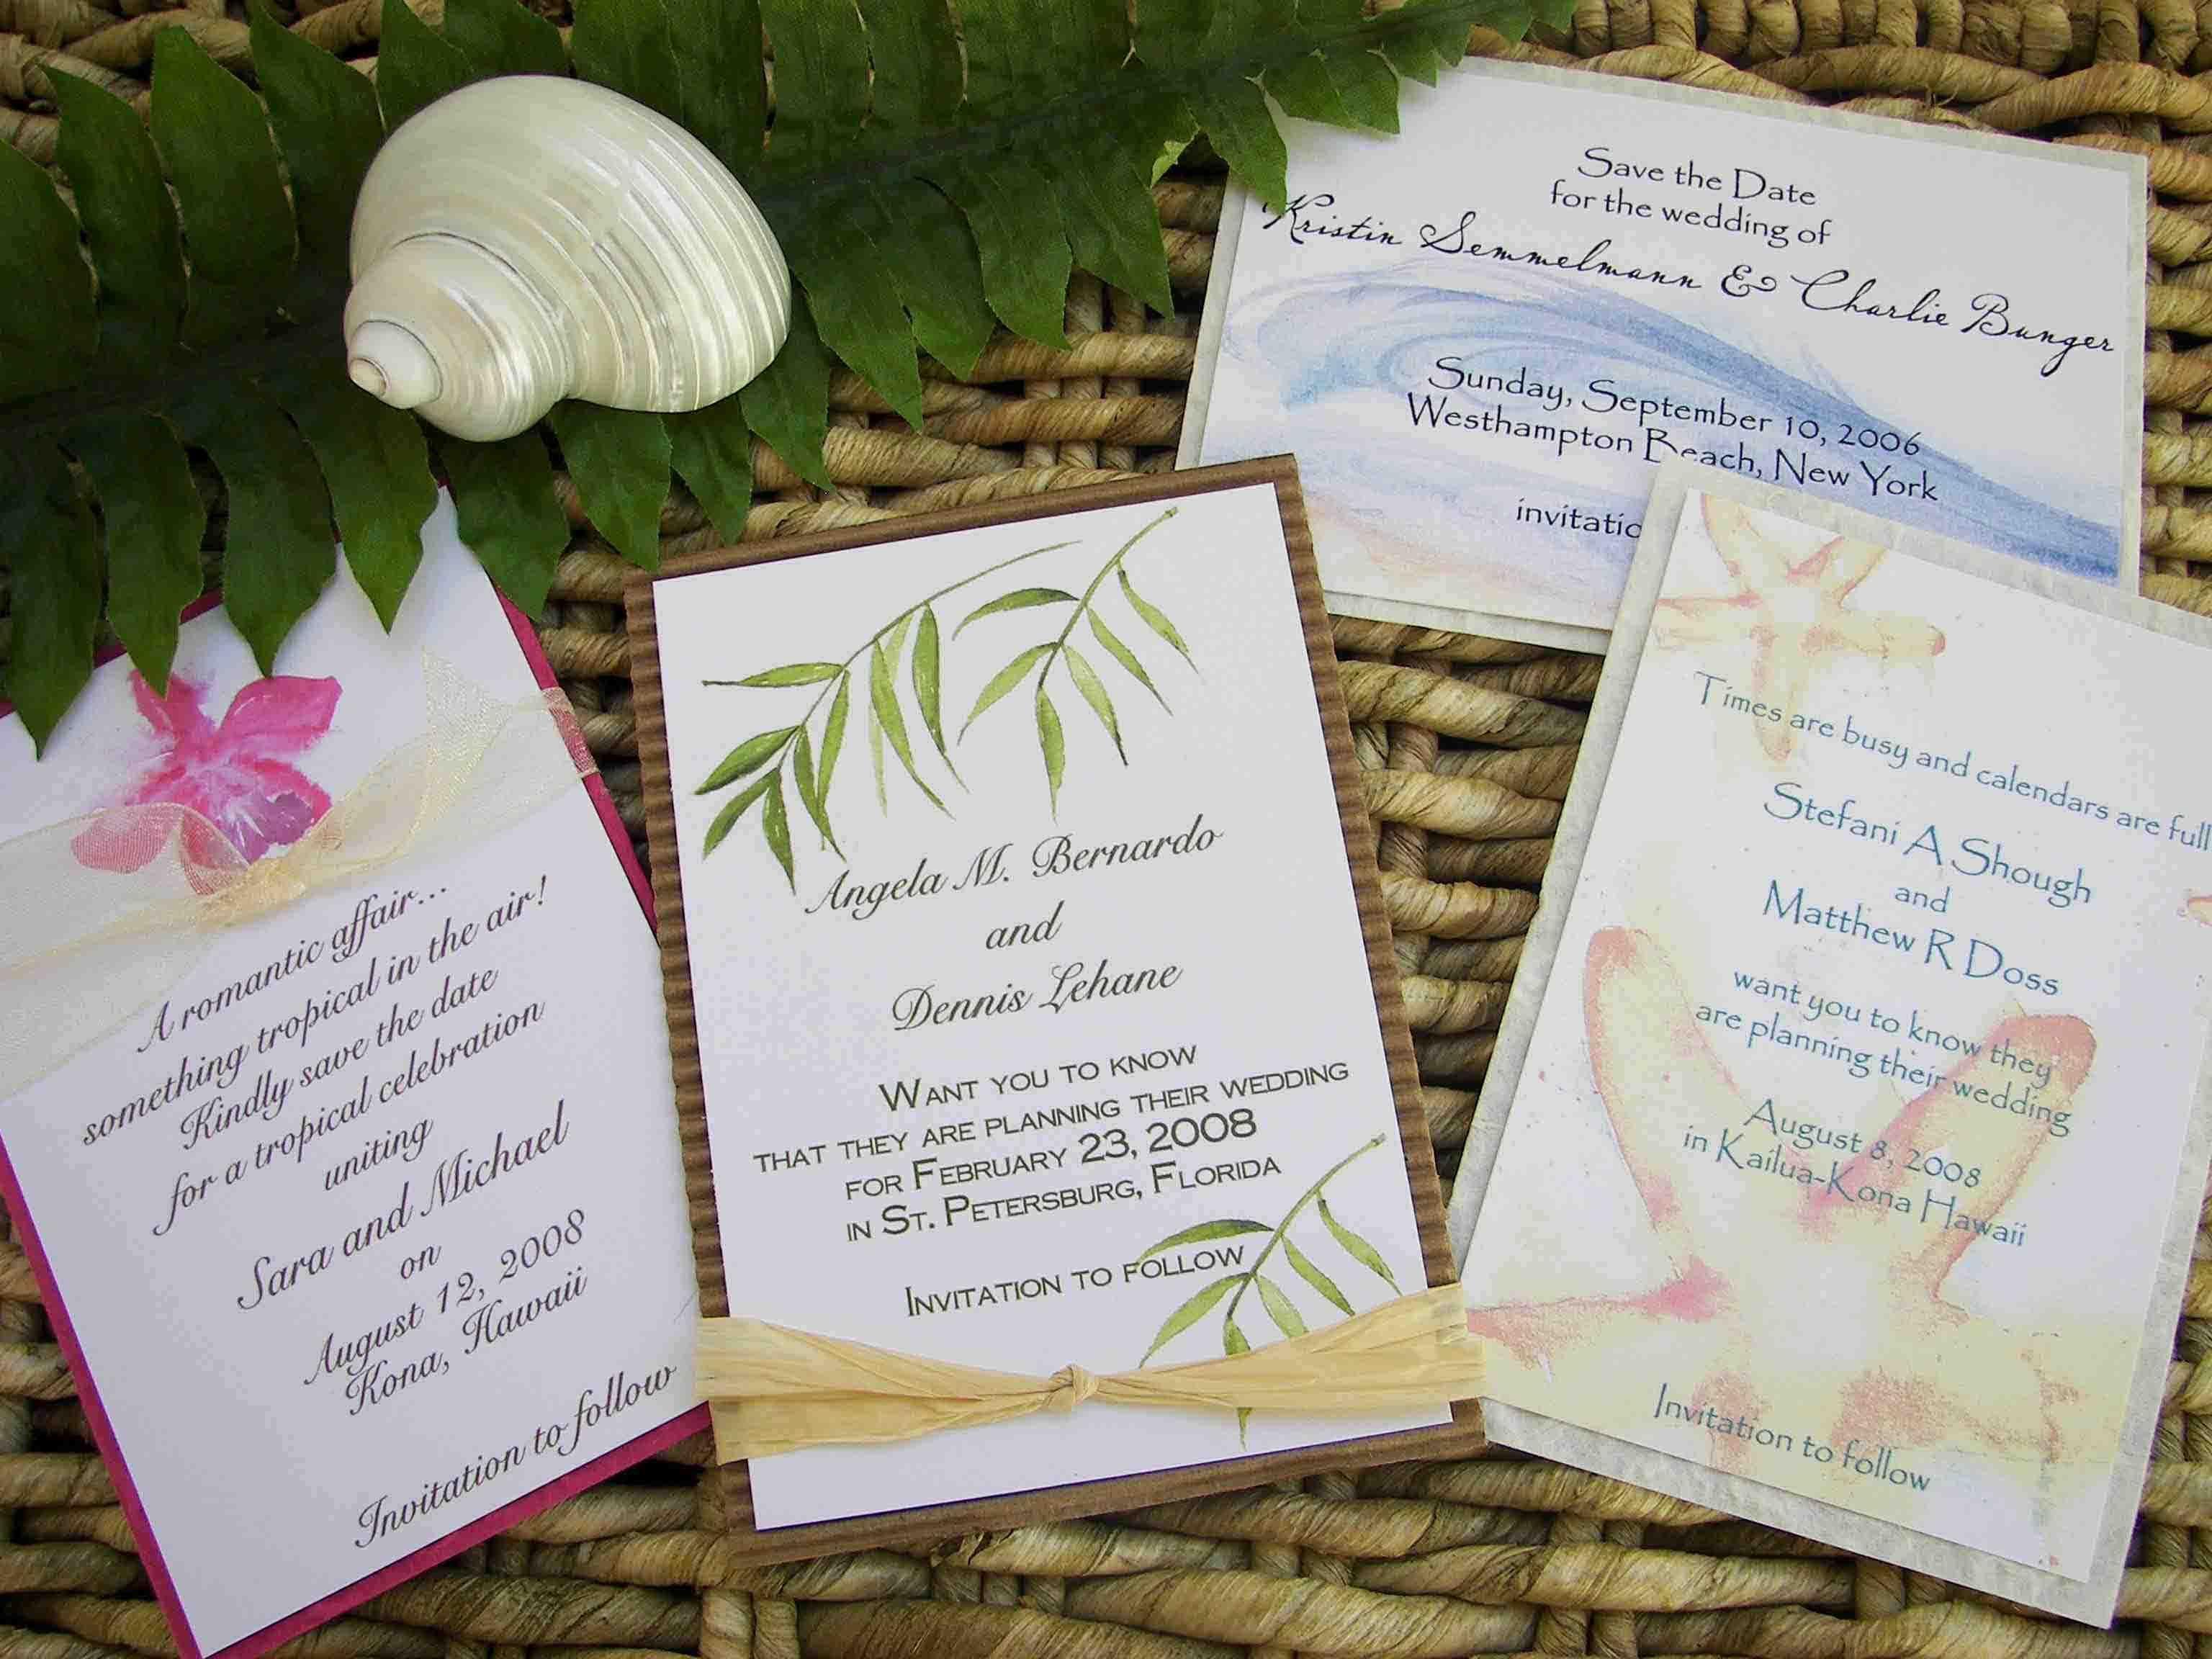 Beach themed wedding invitations do it yourself wedding beach themed wedding invitations do it yourself solutioingenieria Image collections